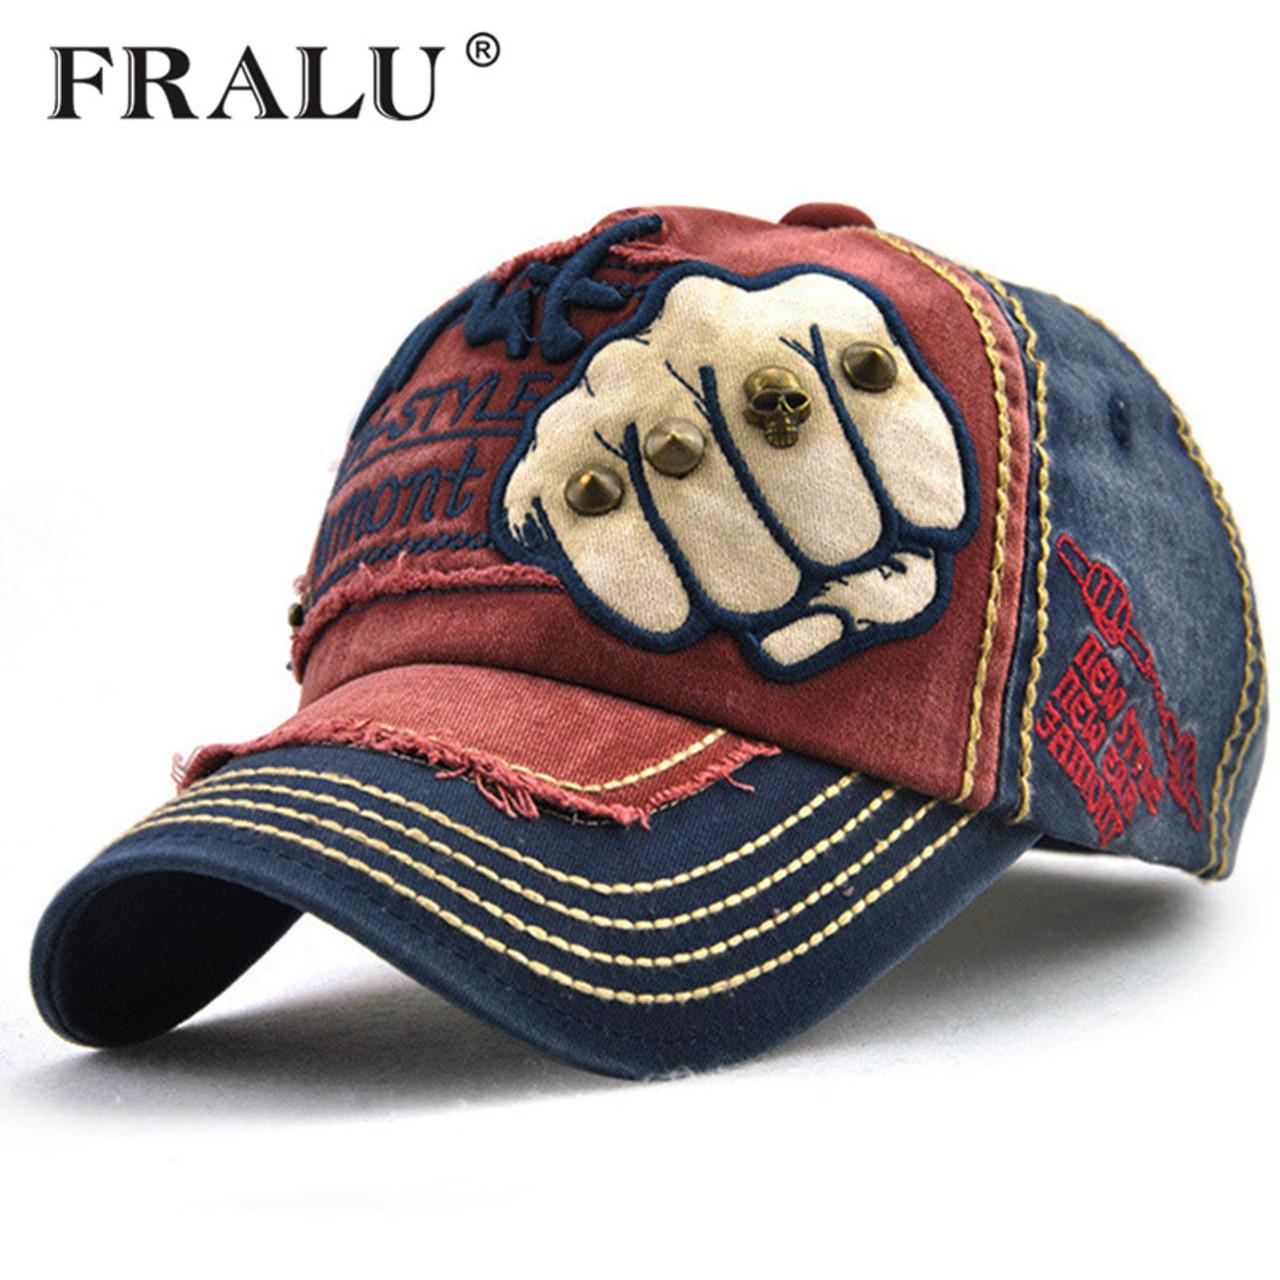 079d67228106 FRALU New unisex fashion men s Baseball Cap women snapback hat Cotton Casual  caps Summer fall Hat ...